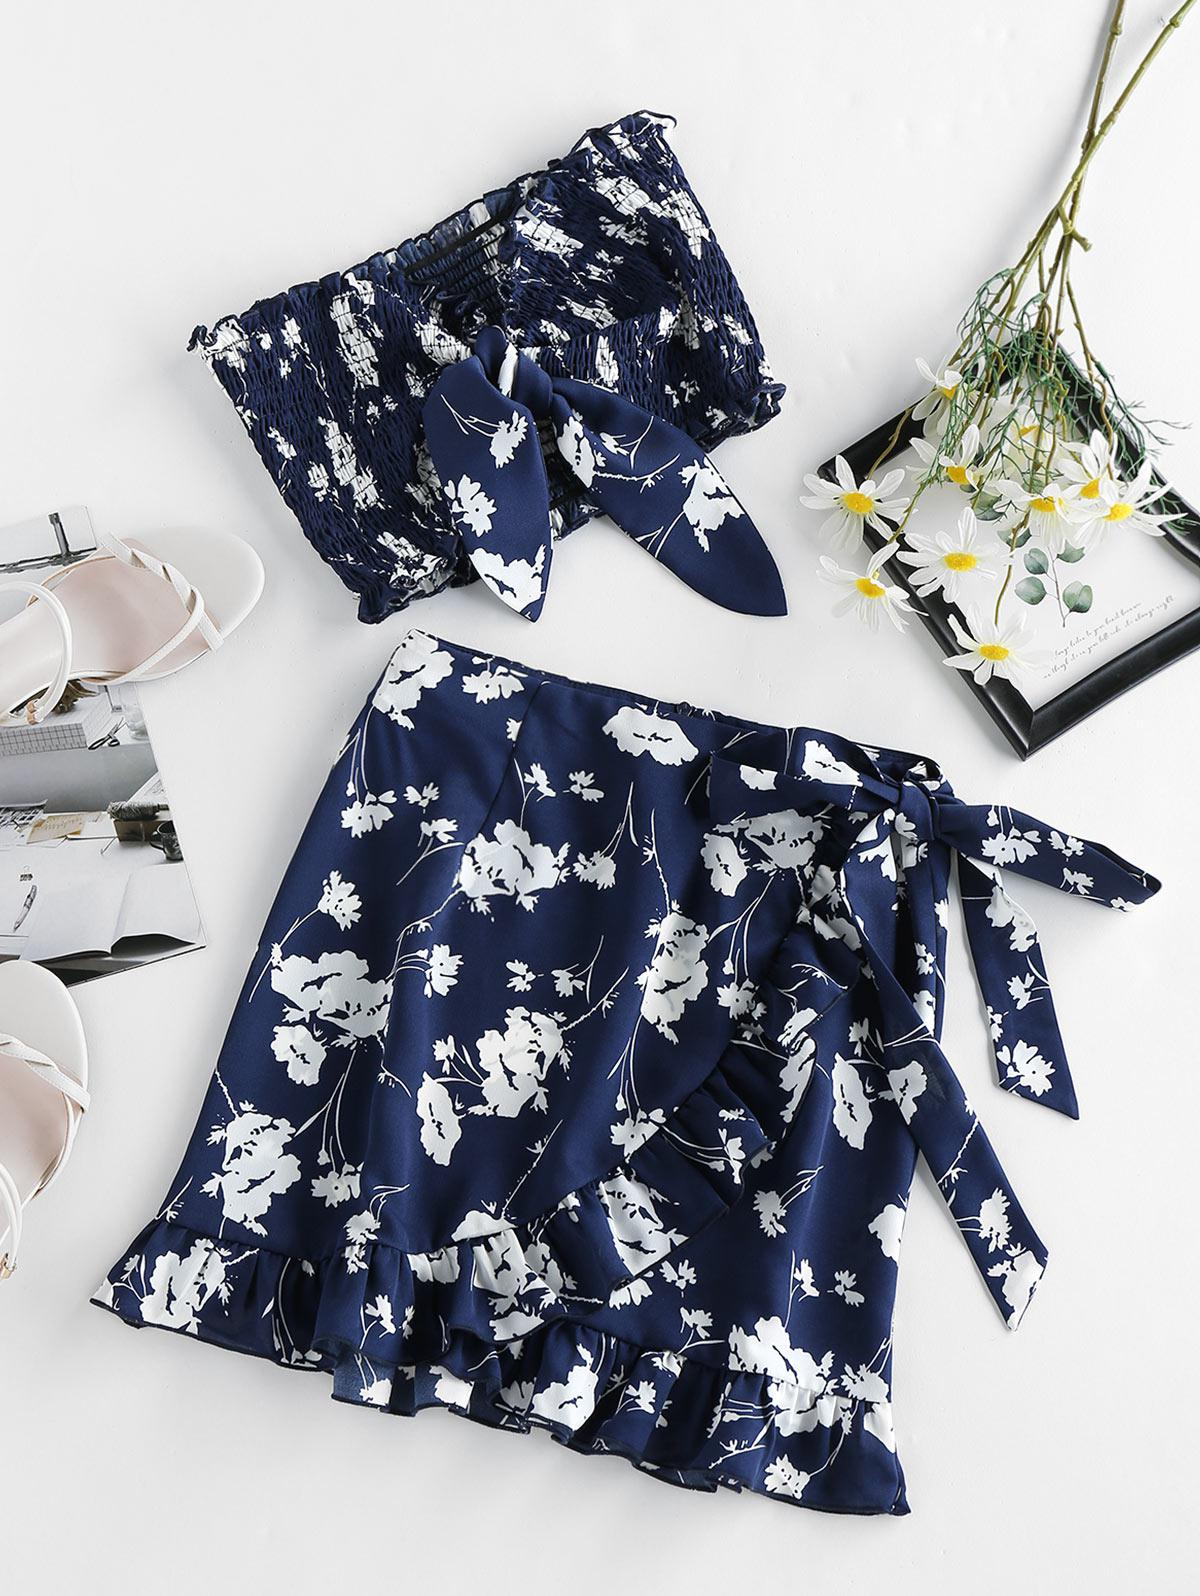 ZAFUL Flower Tied Smocked Ruffle Bandeau Skirt Set